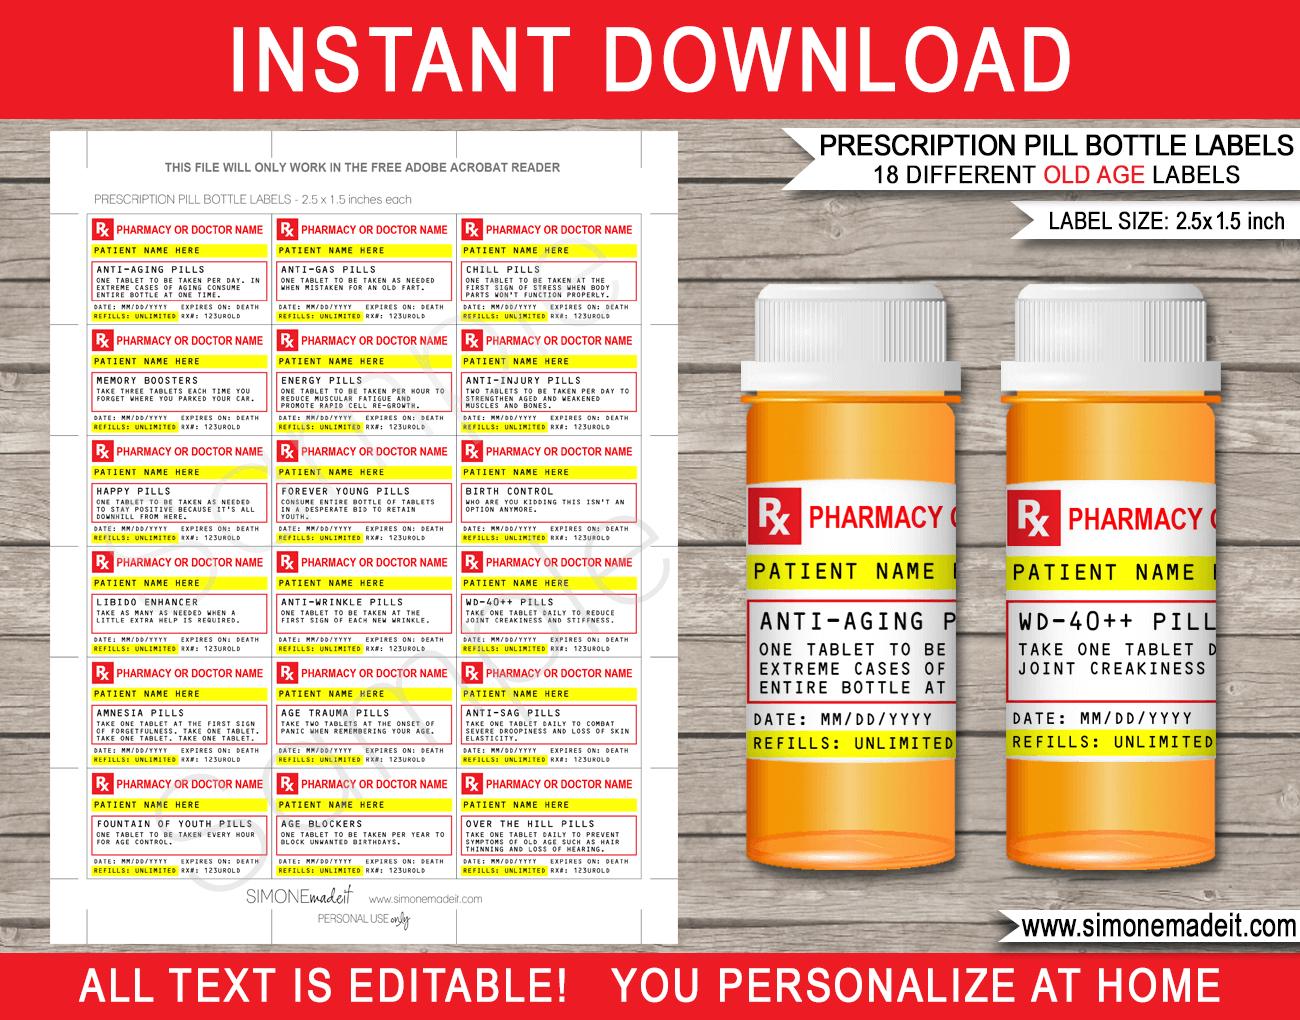 Old Age Prescription Pill Bottle Labels  Gag Gift  Fake Pharmacy Label Pertaining To Pill Bottle Label Template